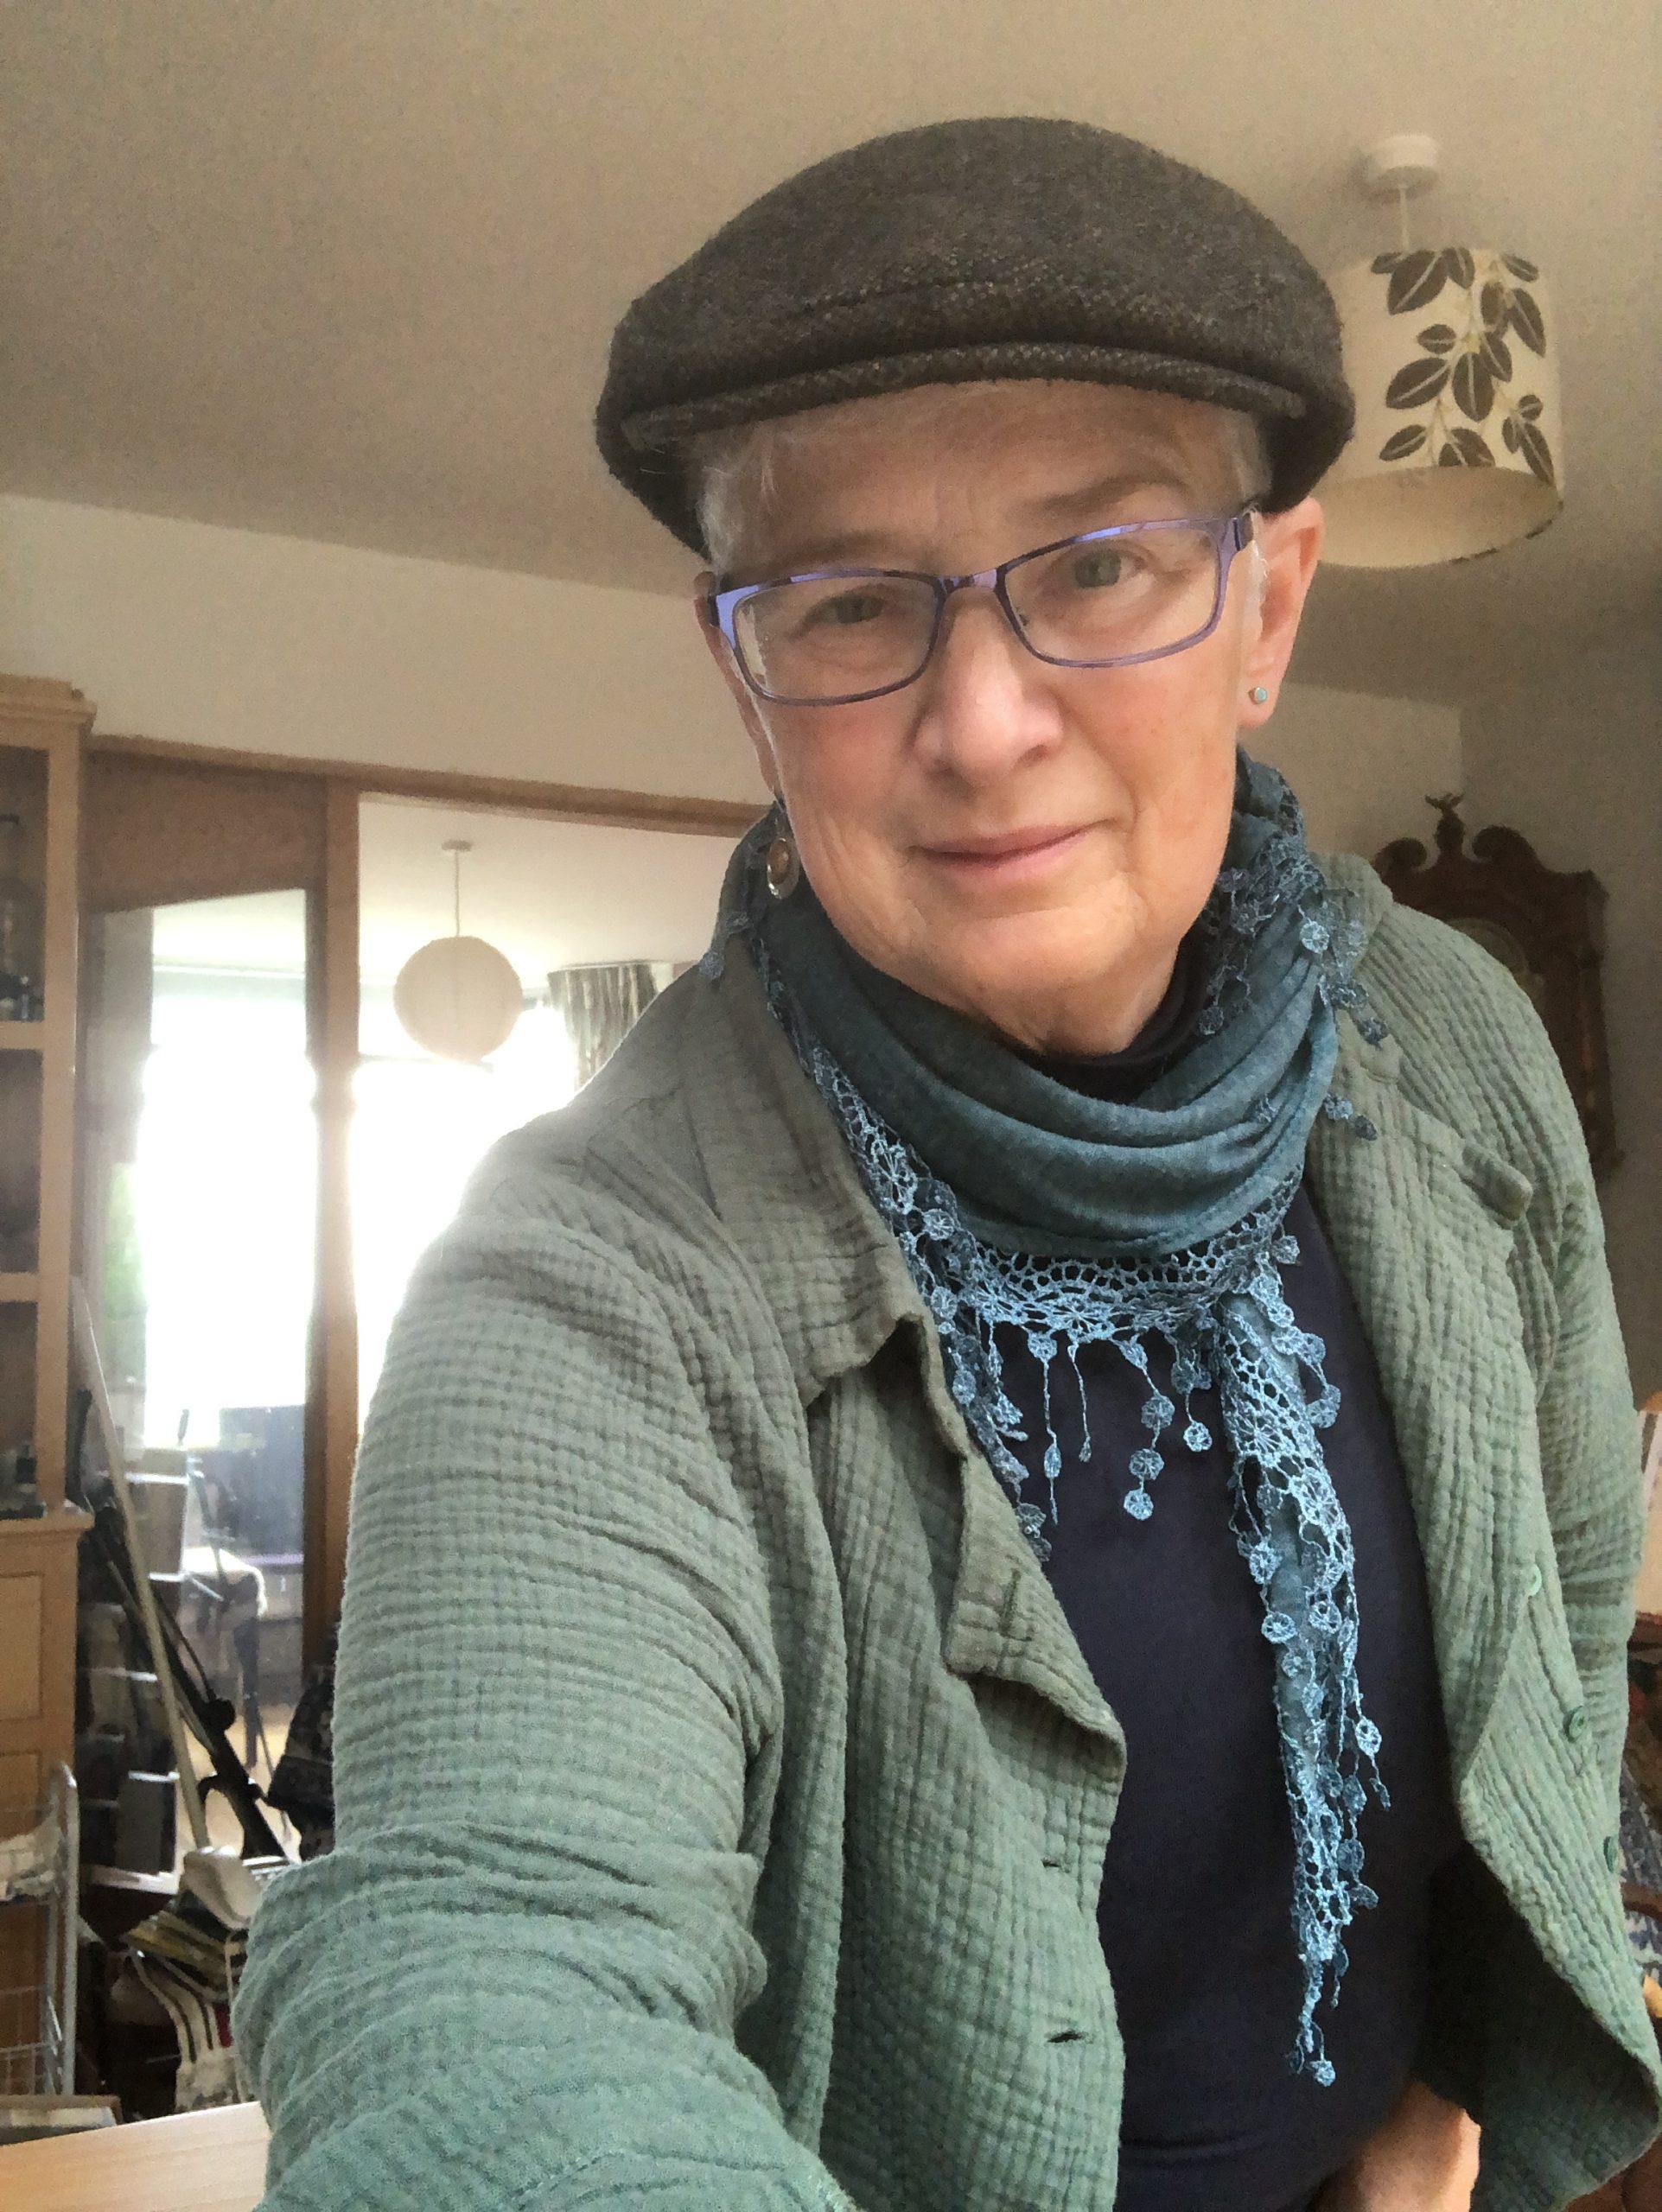 When I'm 64! Top surgery: Gender Dysphoria